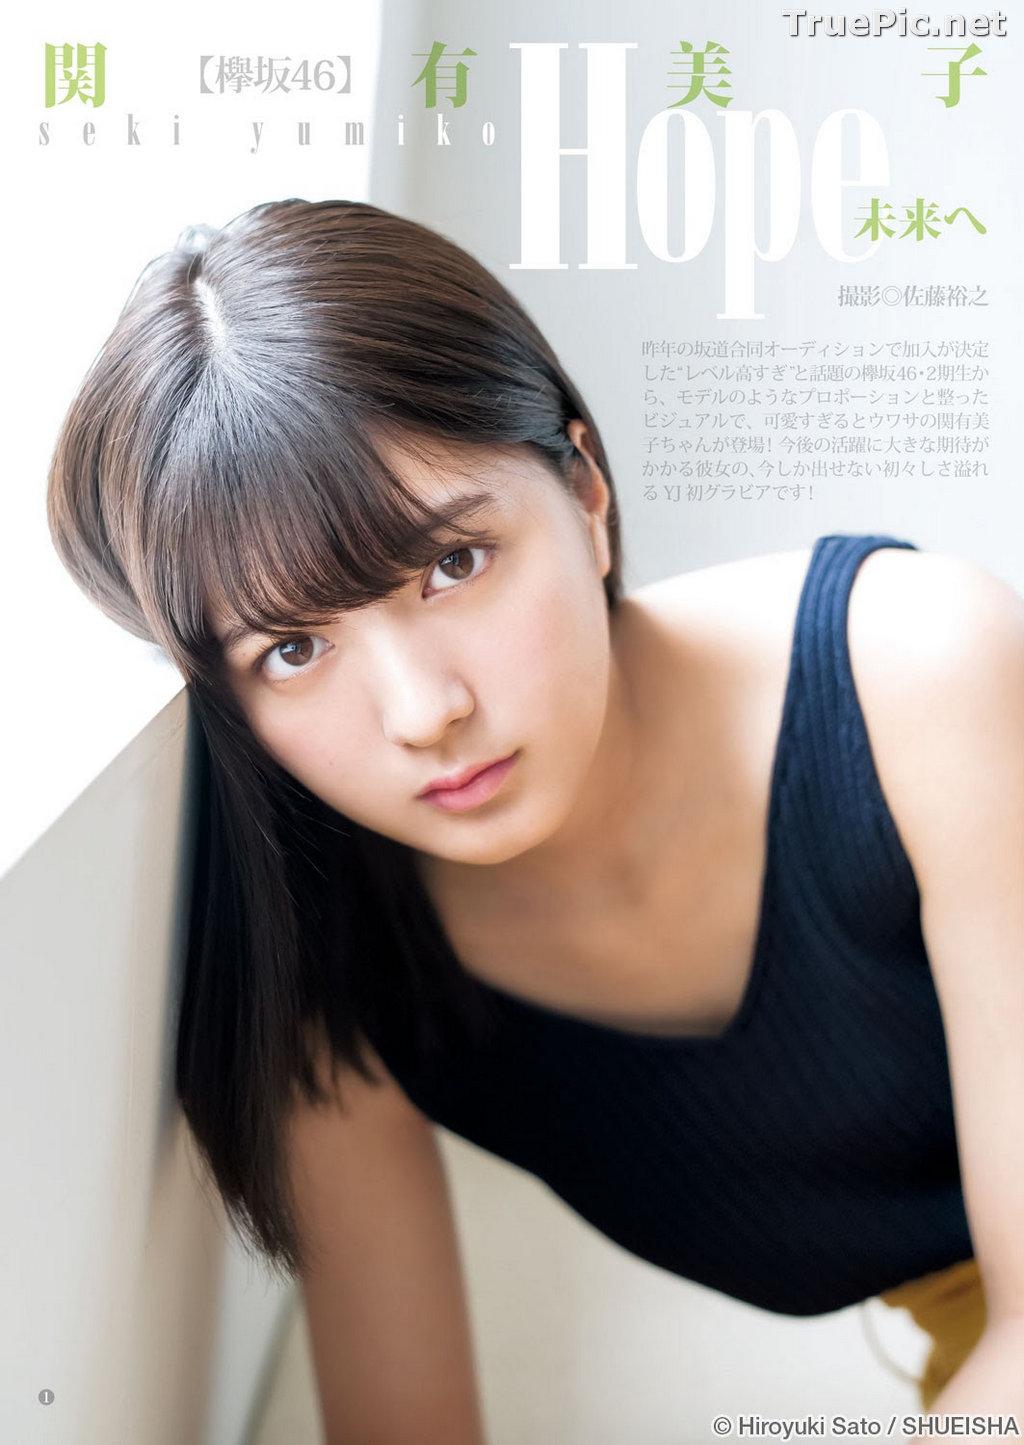 Image Japanese Idol Singer - Yumiko Seki (関有美子) - Beautiful Picture Collection 2020 - TruePic.net - Picture-5